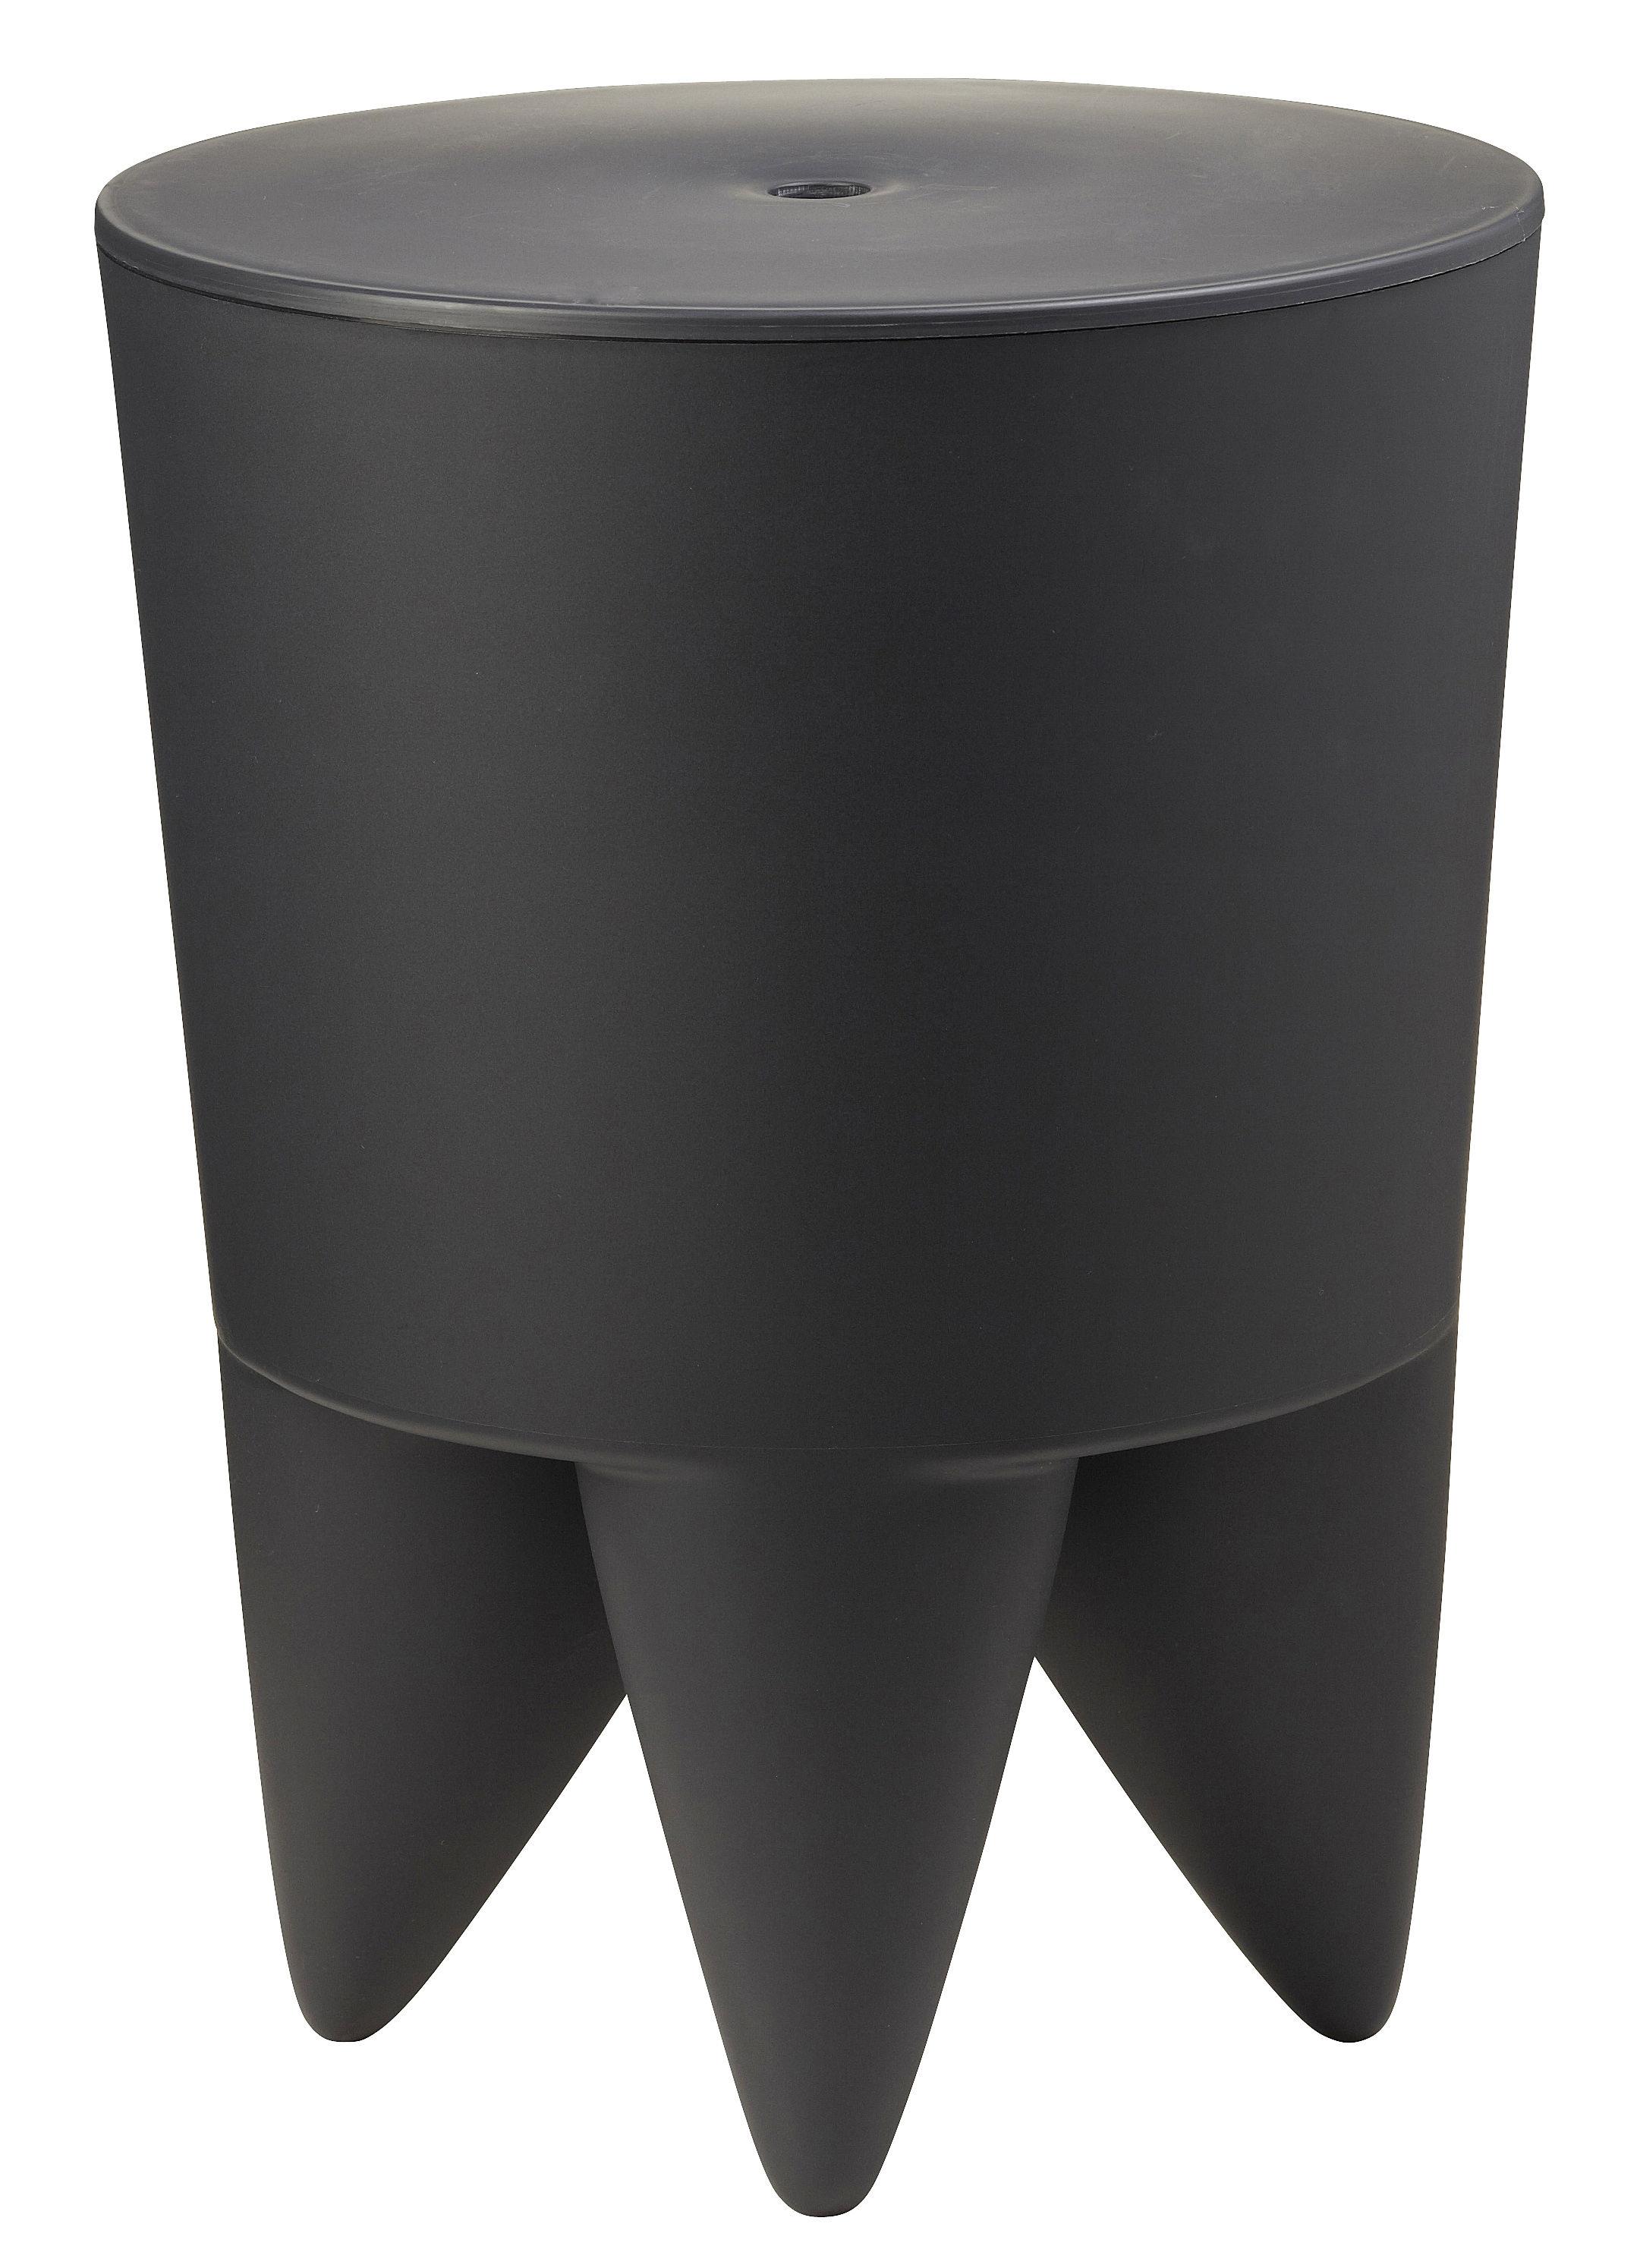 Furniture - Stools - New Bubu 1er Stool by XO - Anthracite - Polypropylene